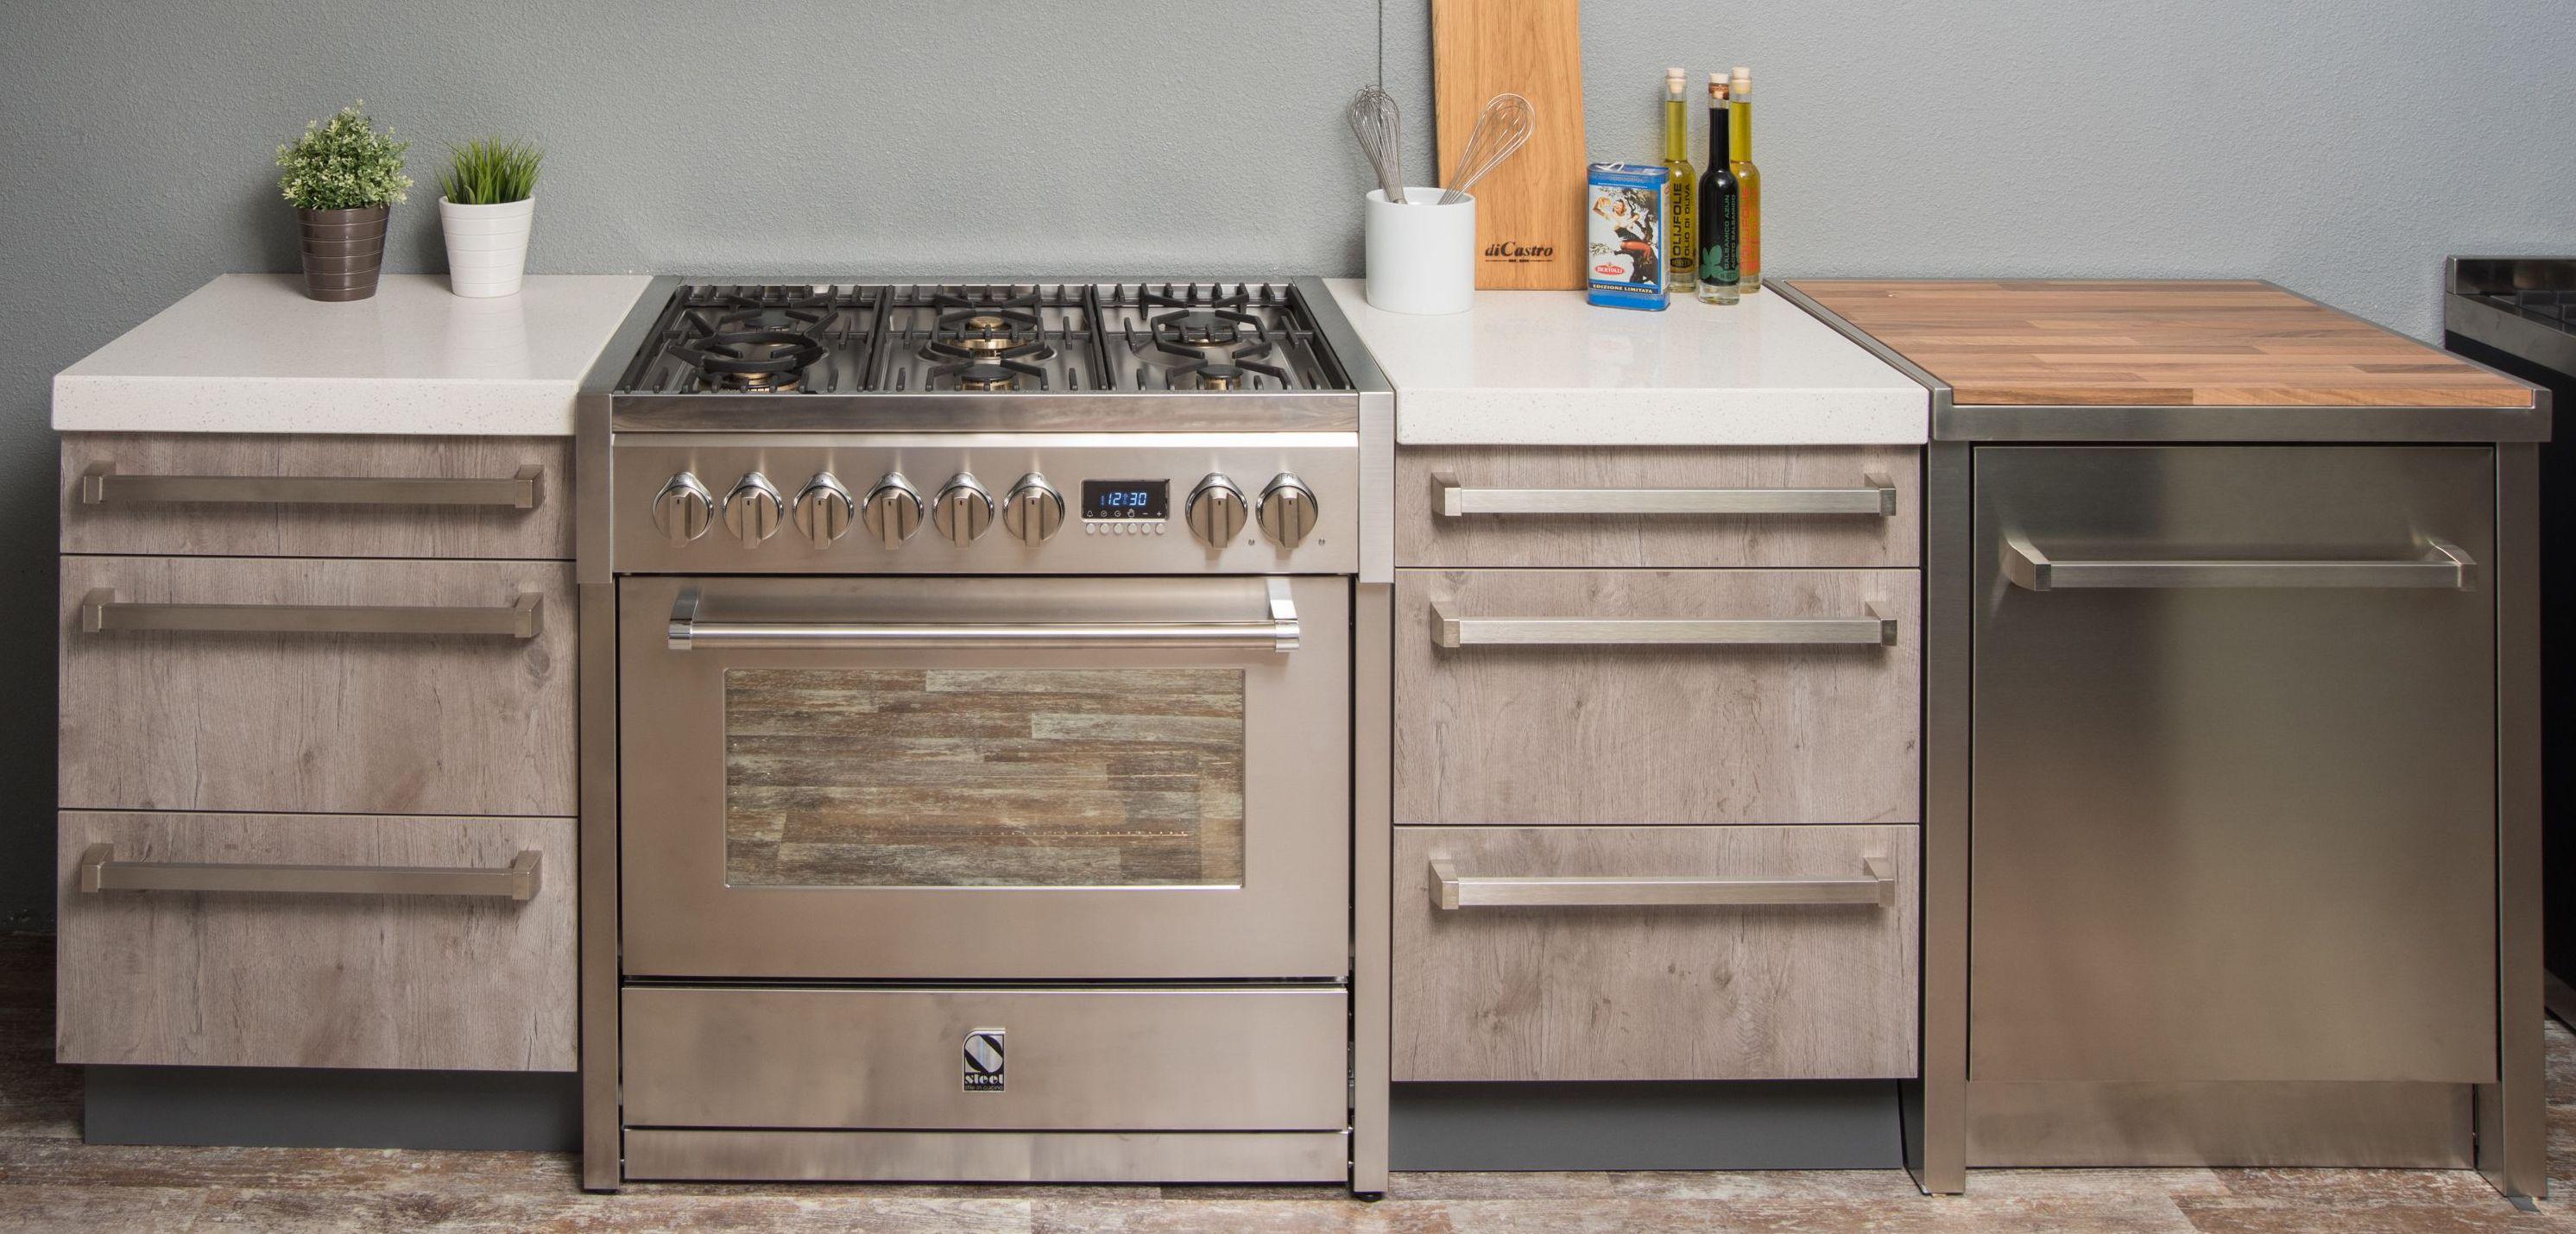 Module keukens van hout en RVs met robuuste fornuis. Steel en Elementi di Cucina modulaire keukens #keuken #keukeninspiratie #modules #keukenmodules #modulairekeukens